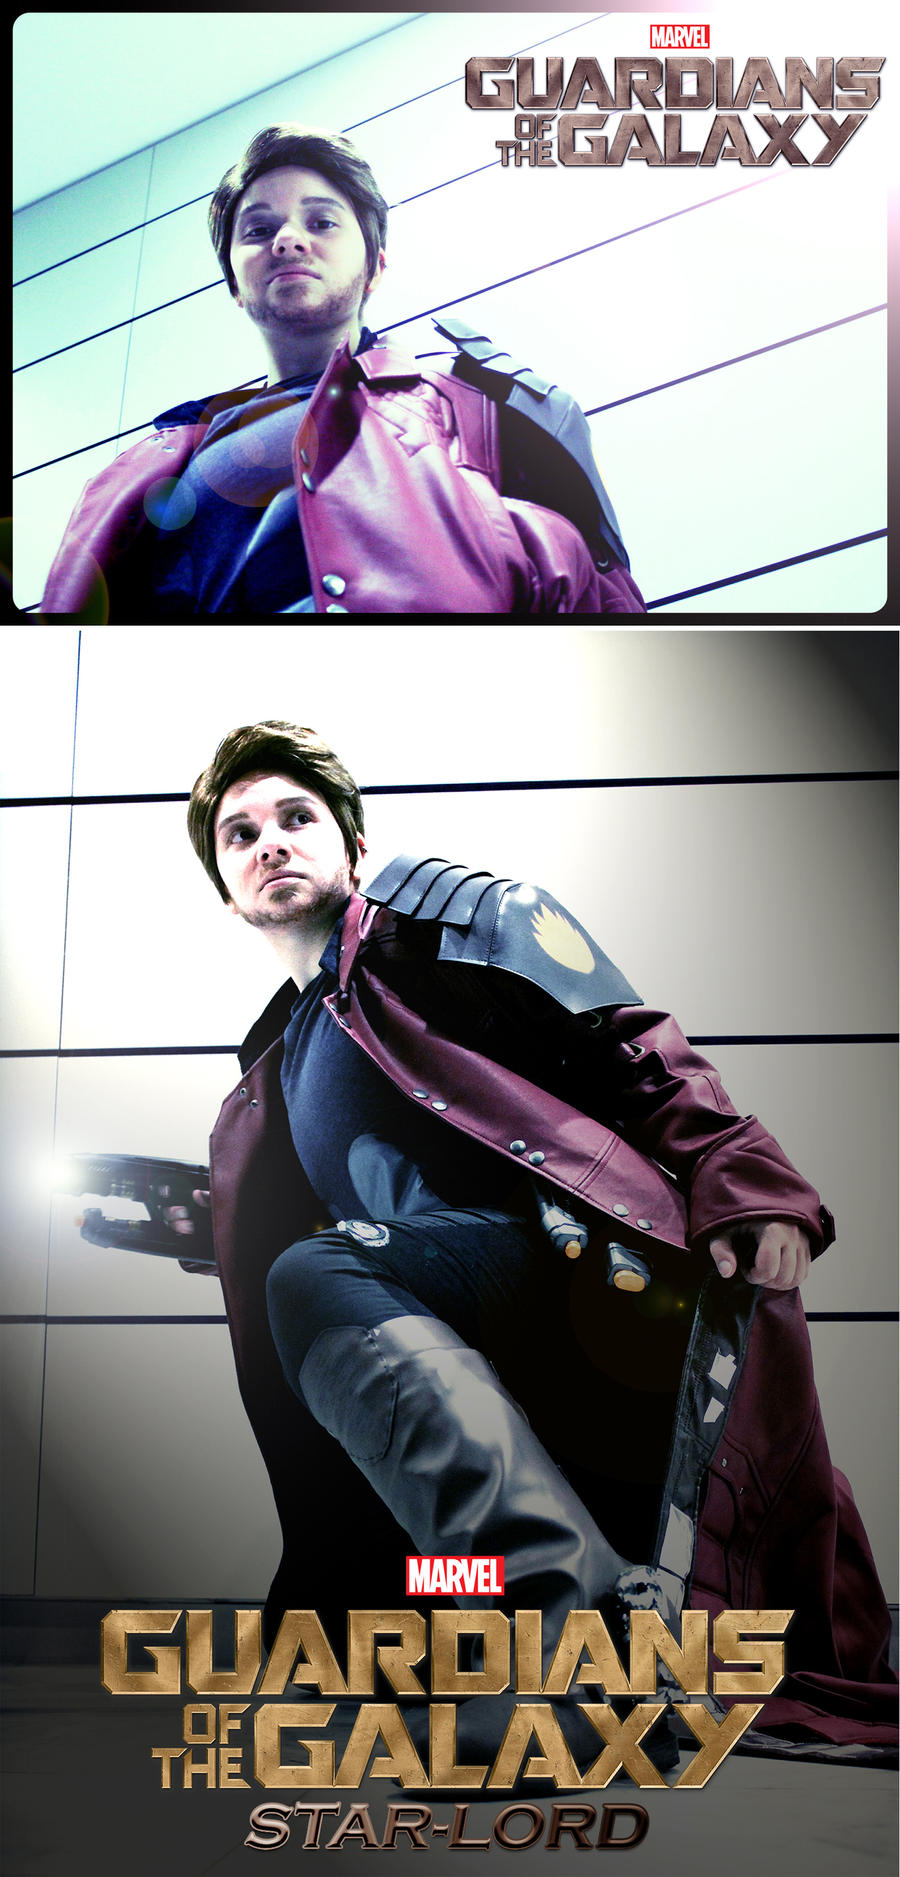 Star lord cosplay 2 by xxgogetacatxx on deviantart